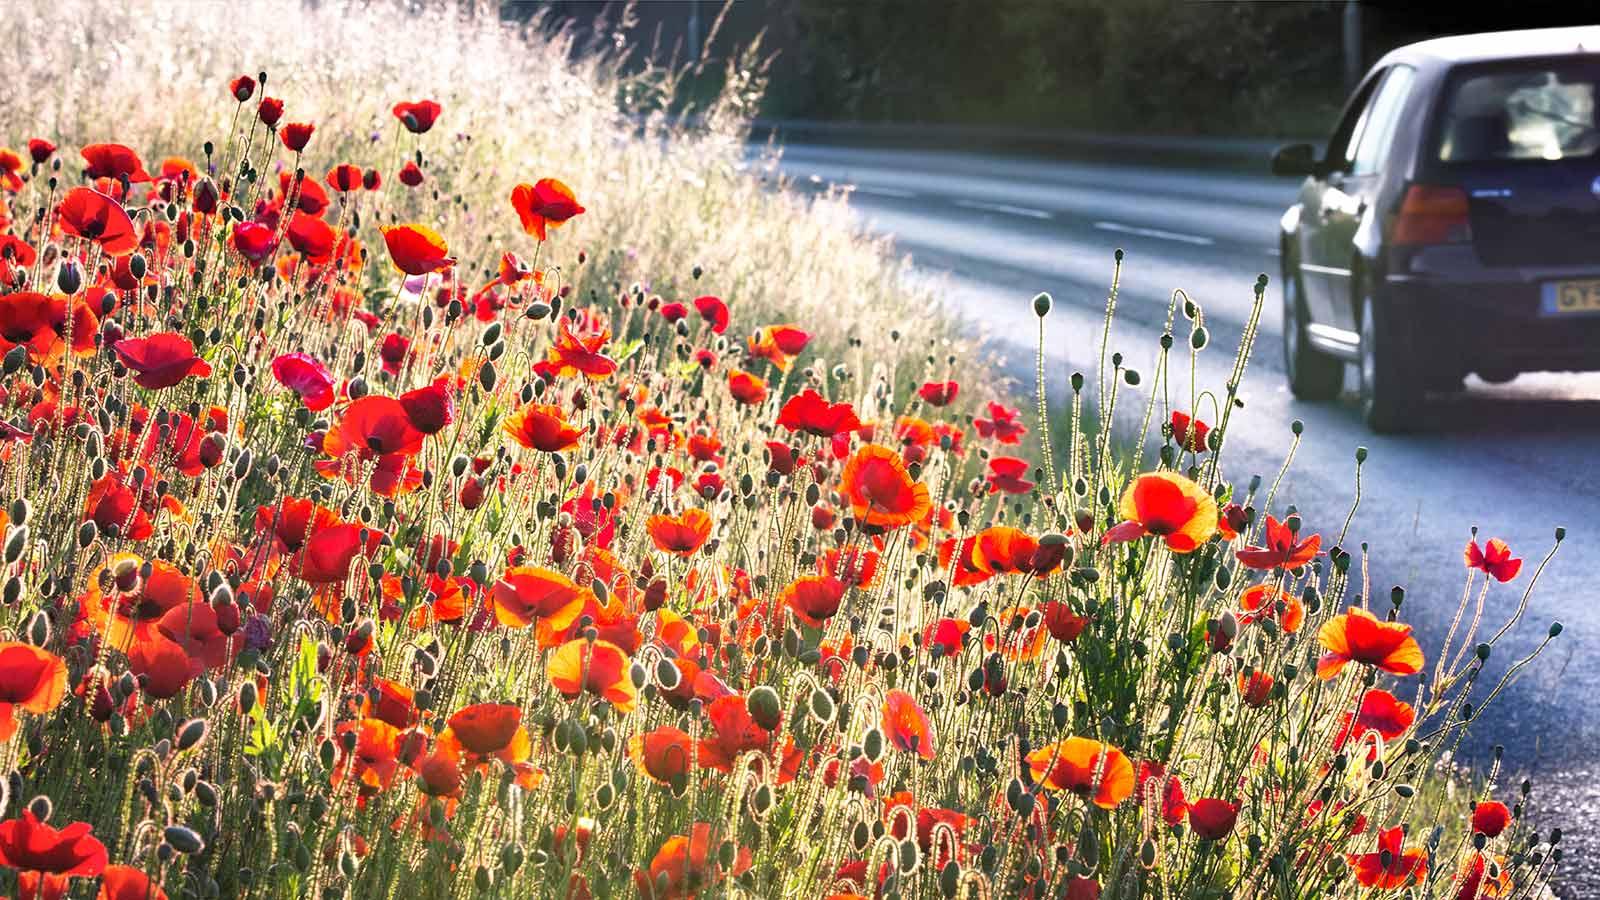 An Urban Roadside Poppy Meadow, © Nigel Burkitt, Winner in category Greening Grey Britain, RHS Photographic Competition / RHS Gardening